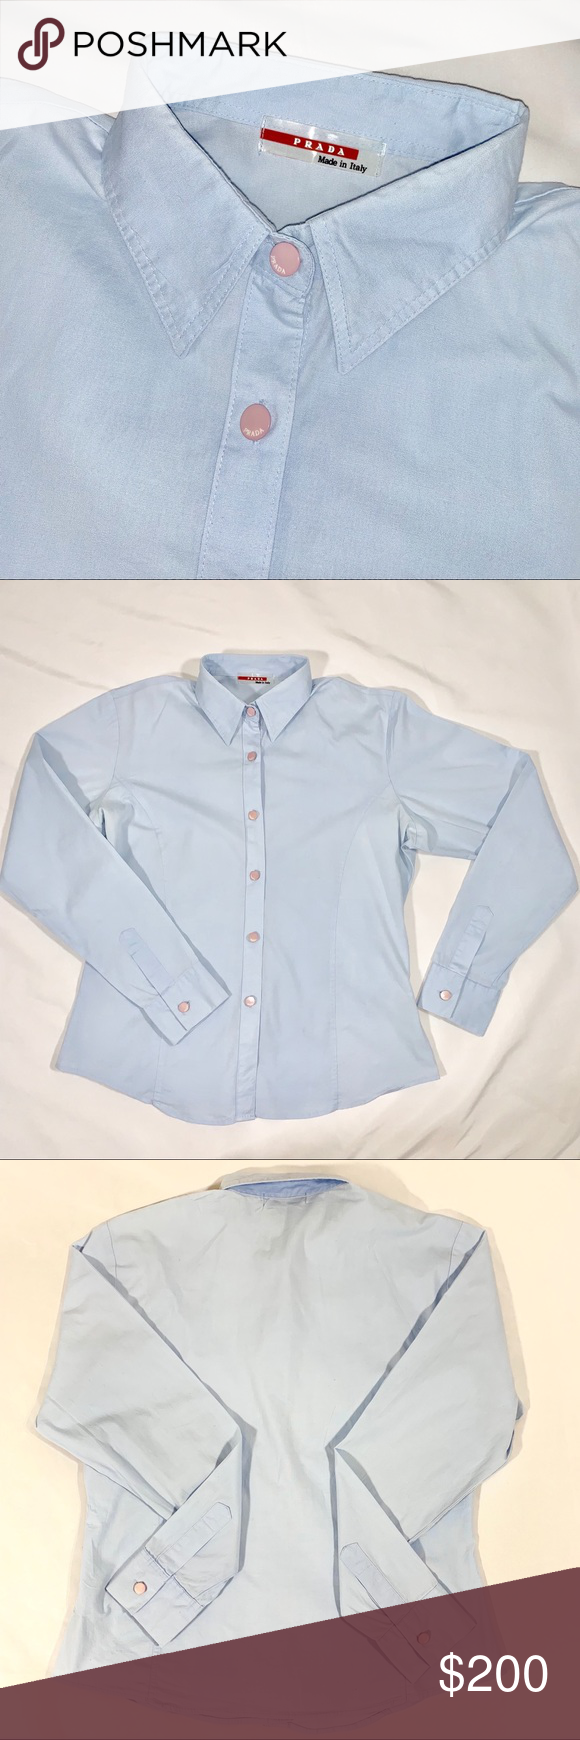 00ef50ee98 ⚡️SALE⚡️PRADA Blue Shirt with Pink Button AMAZING Prada shirt ...